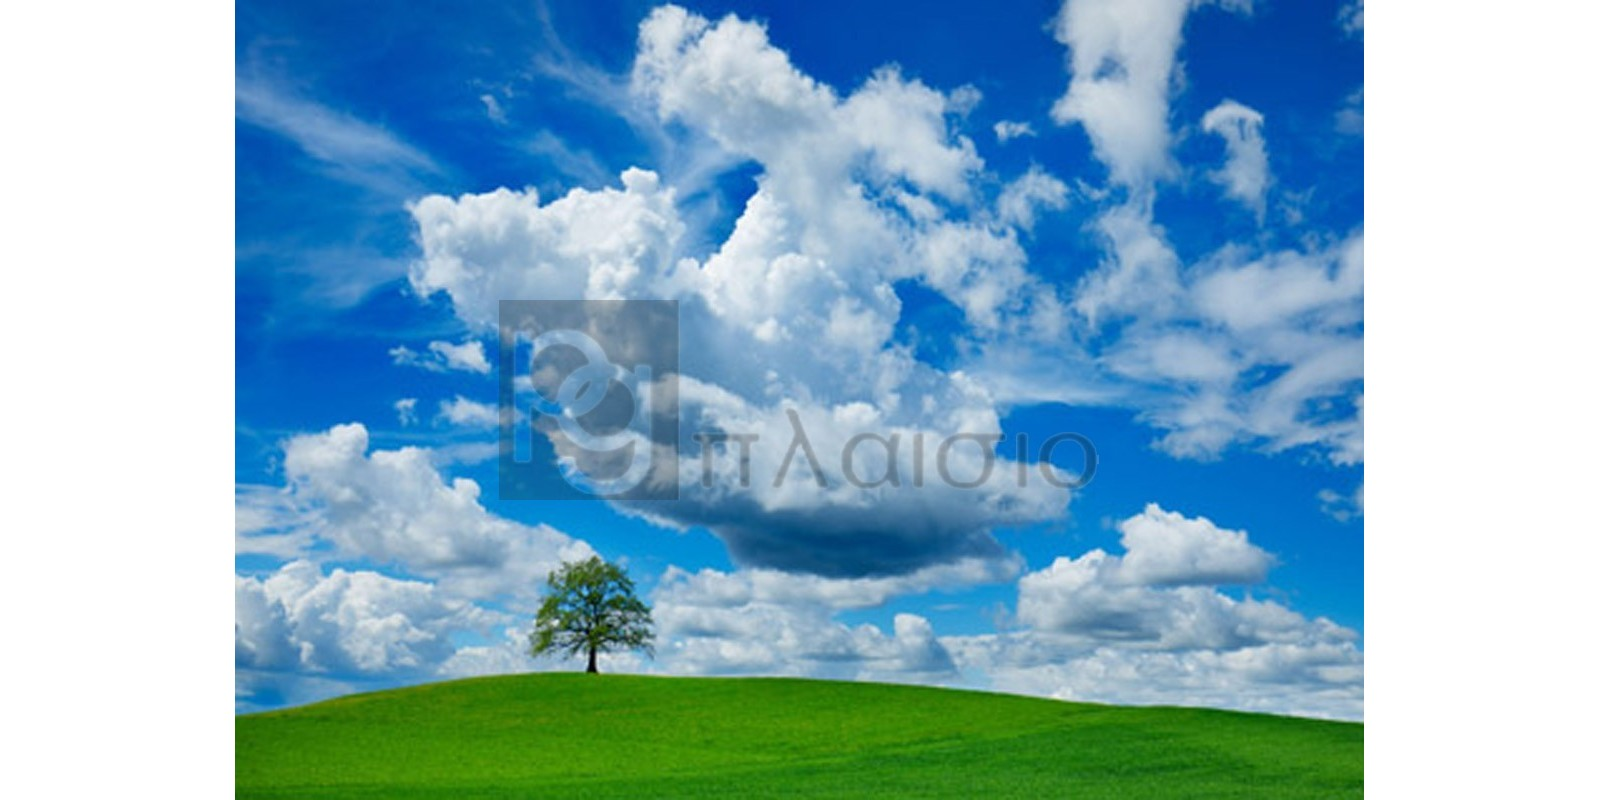 FRANK KRAHMER - Oak and clouds, Bavaria, Germany